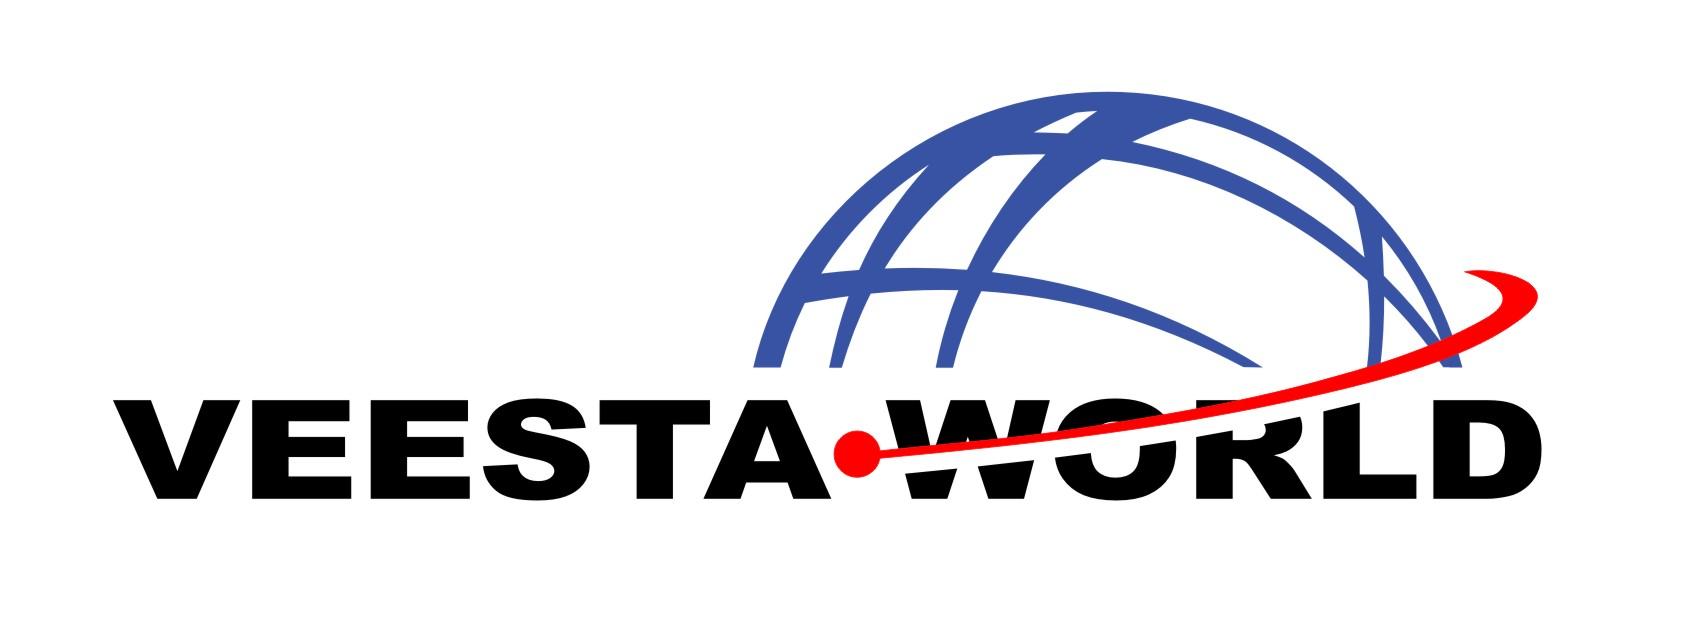 1687x625 Logo 15 Free Images